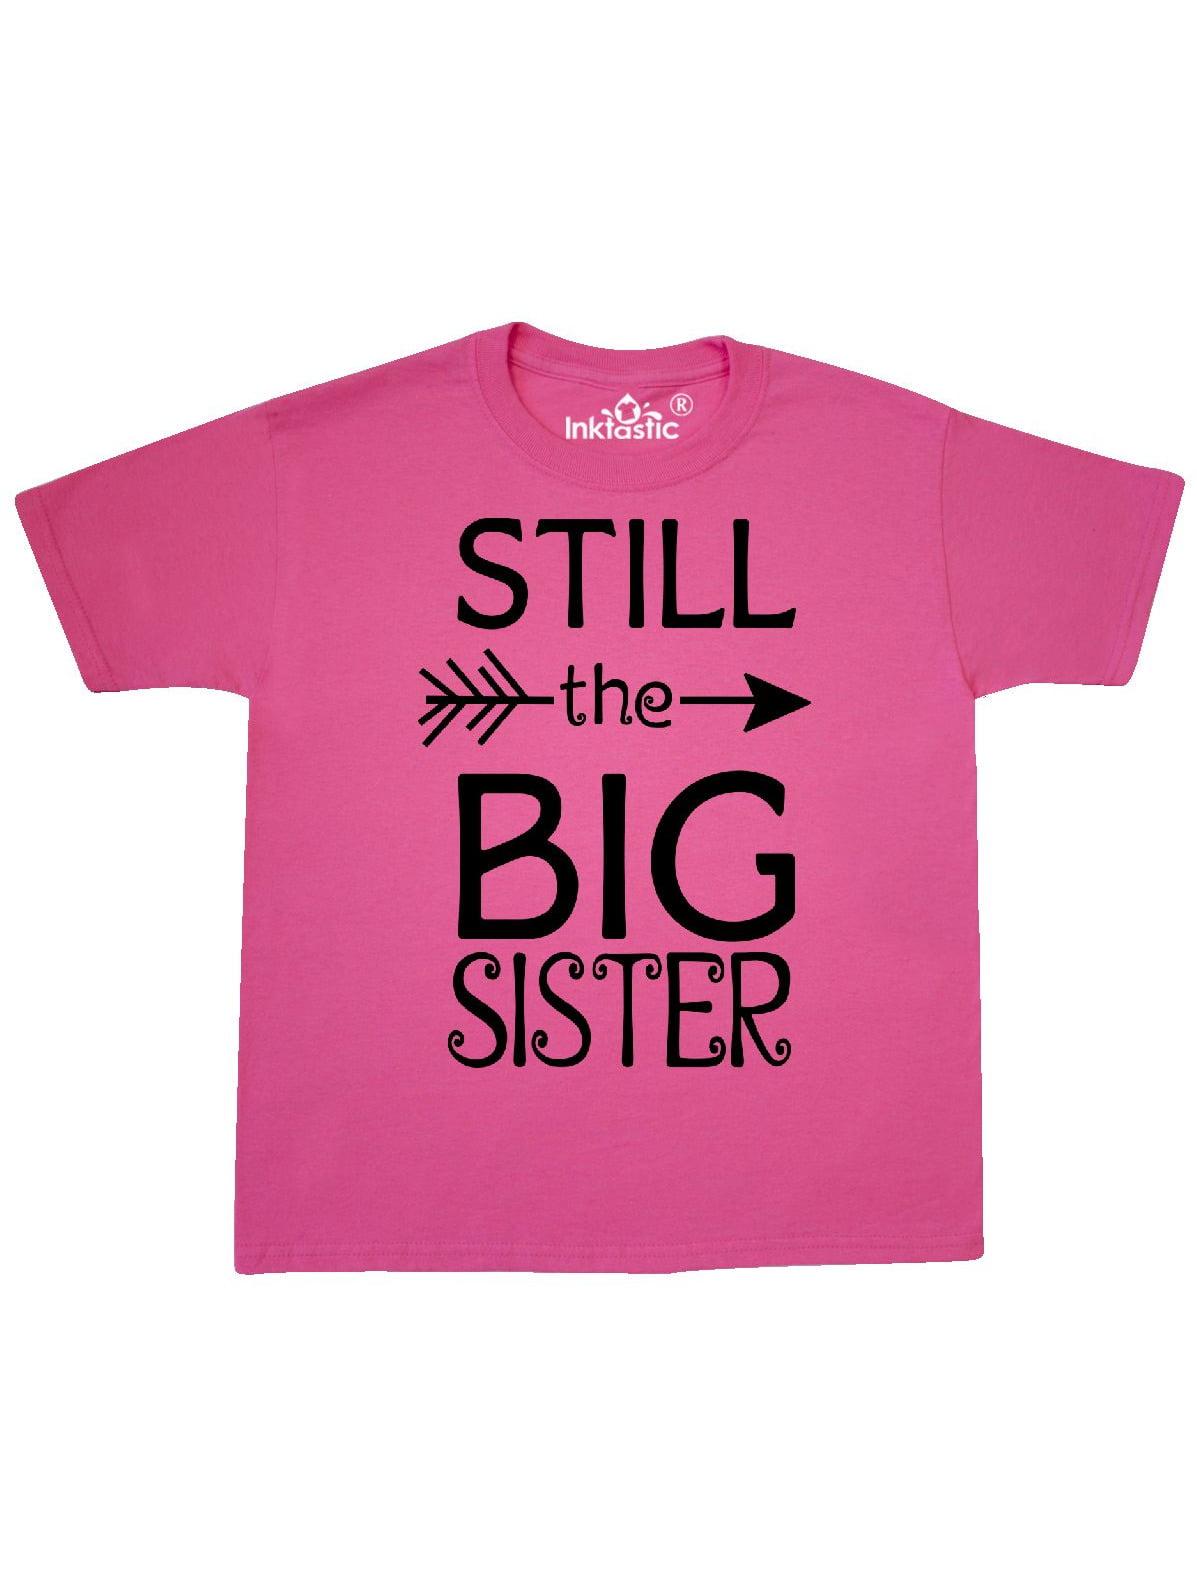 Still the Big Sister Youth T-Shirt